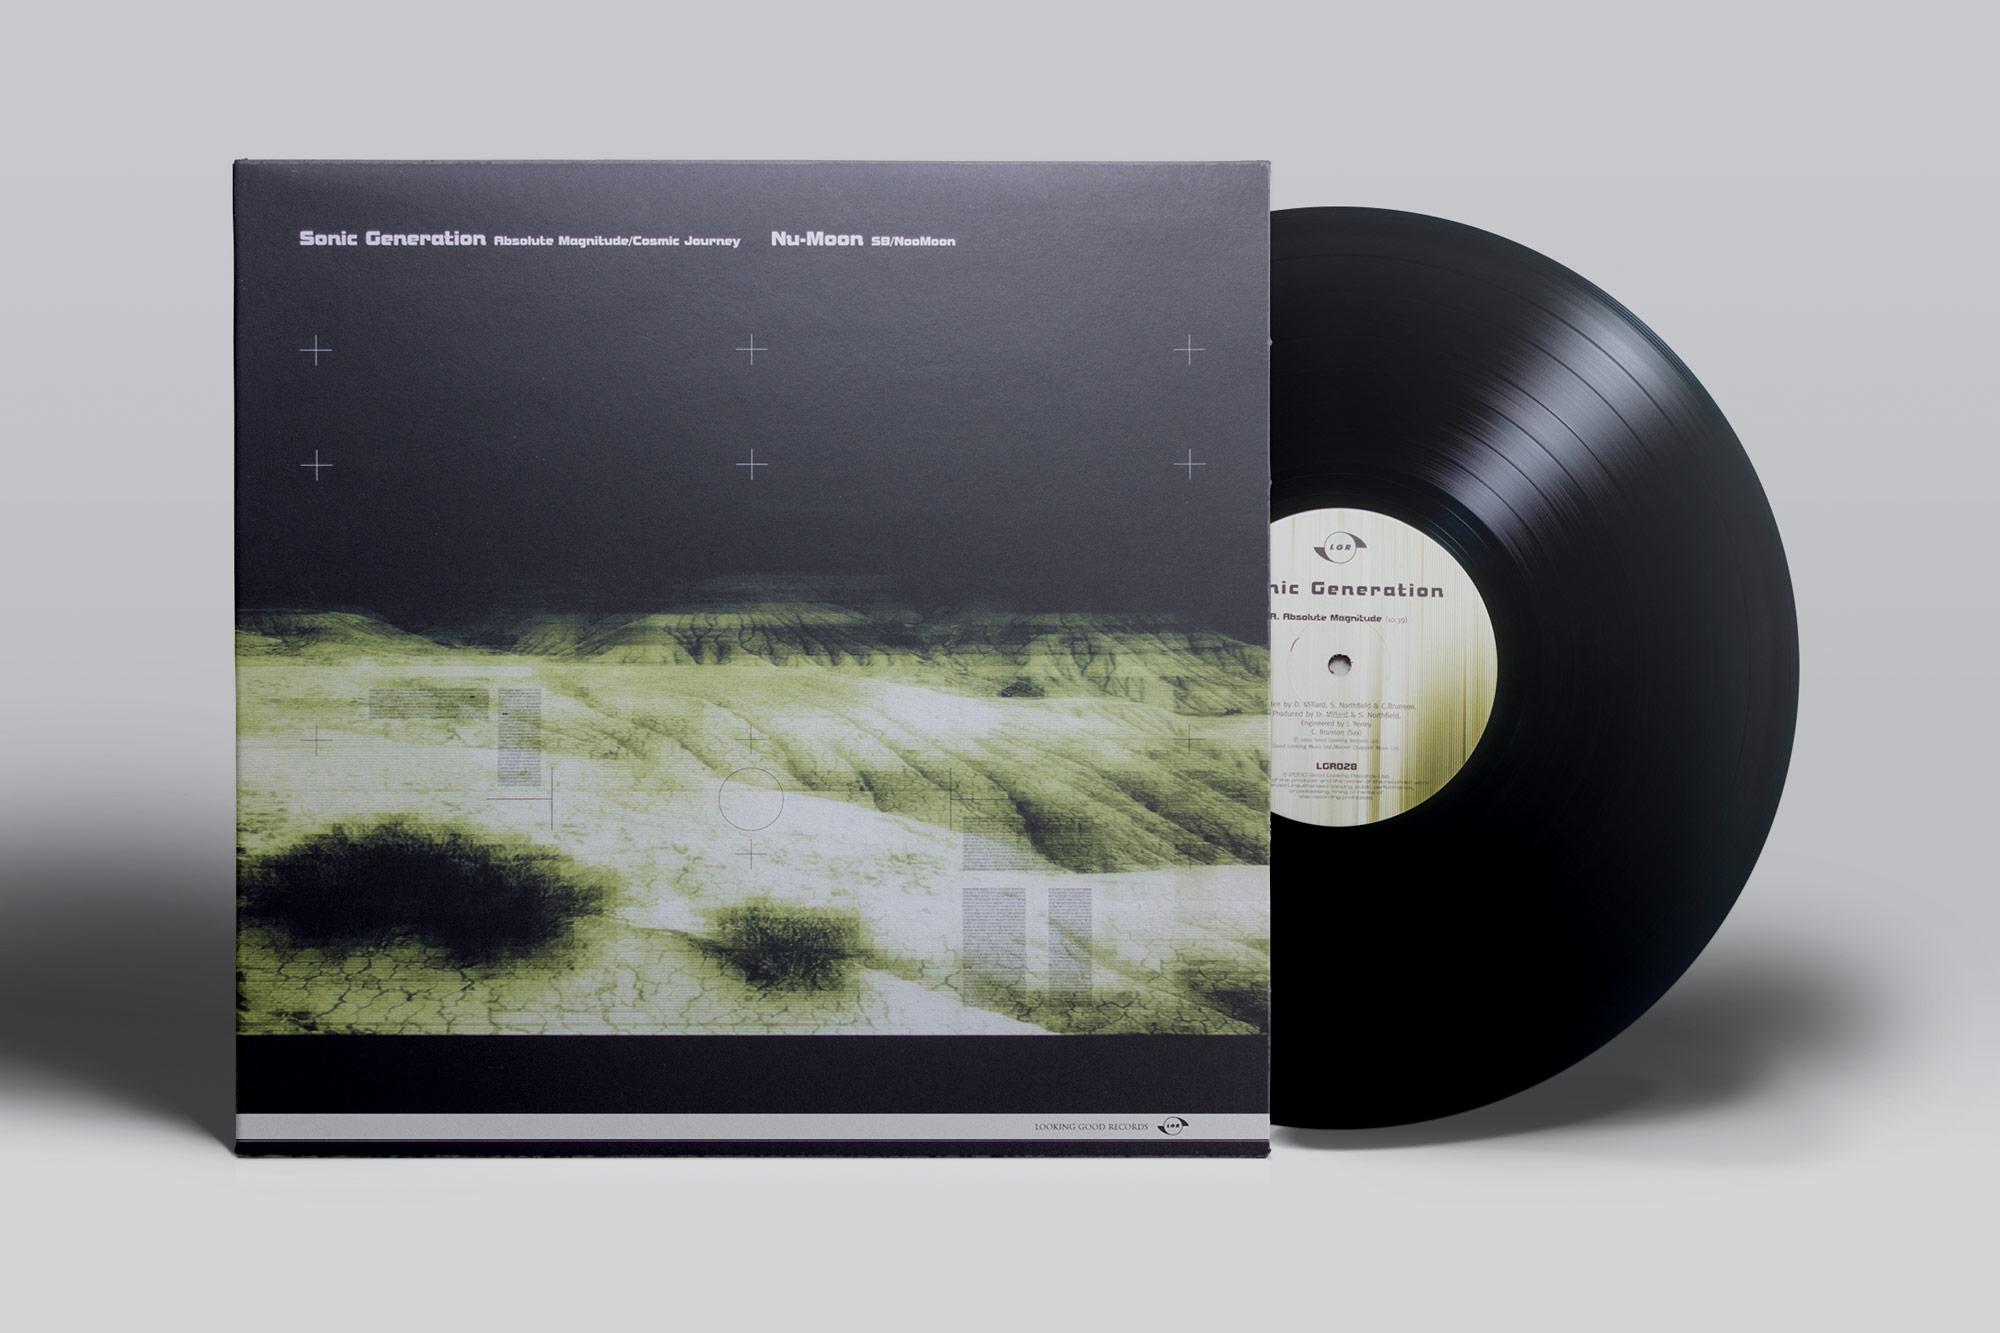 gareth-paul-jones-studio-design-looking-good-records-12-covers-cs-13-LGR028-LGR029